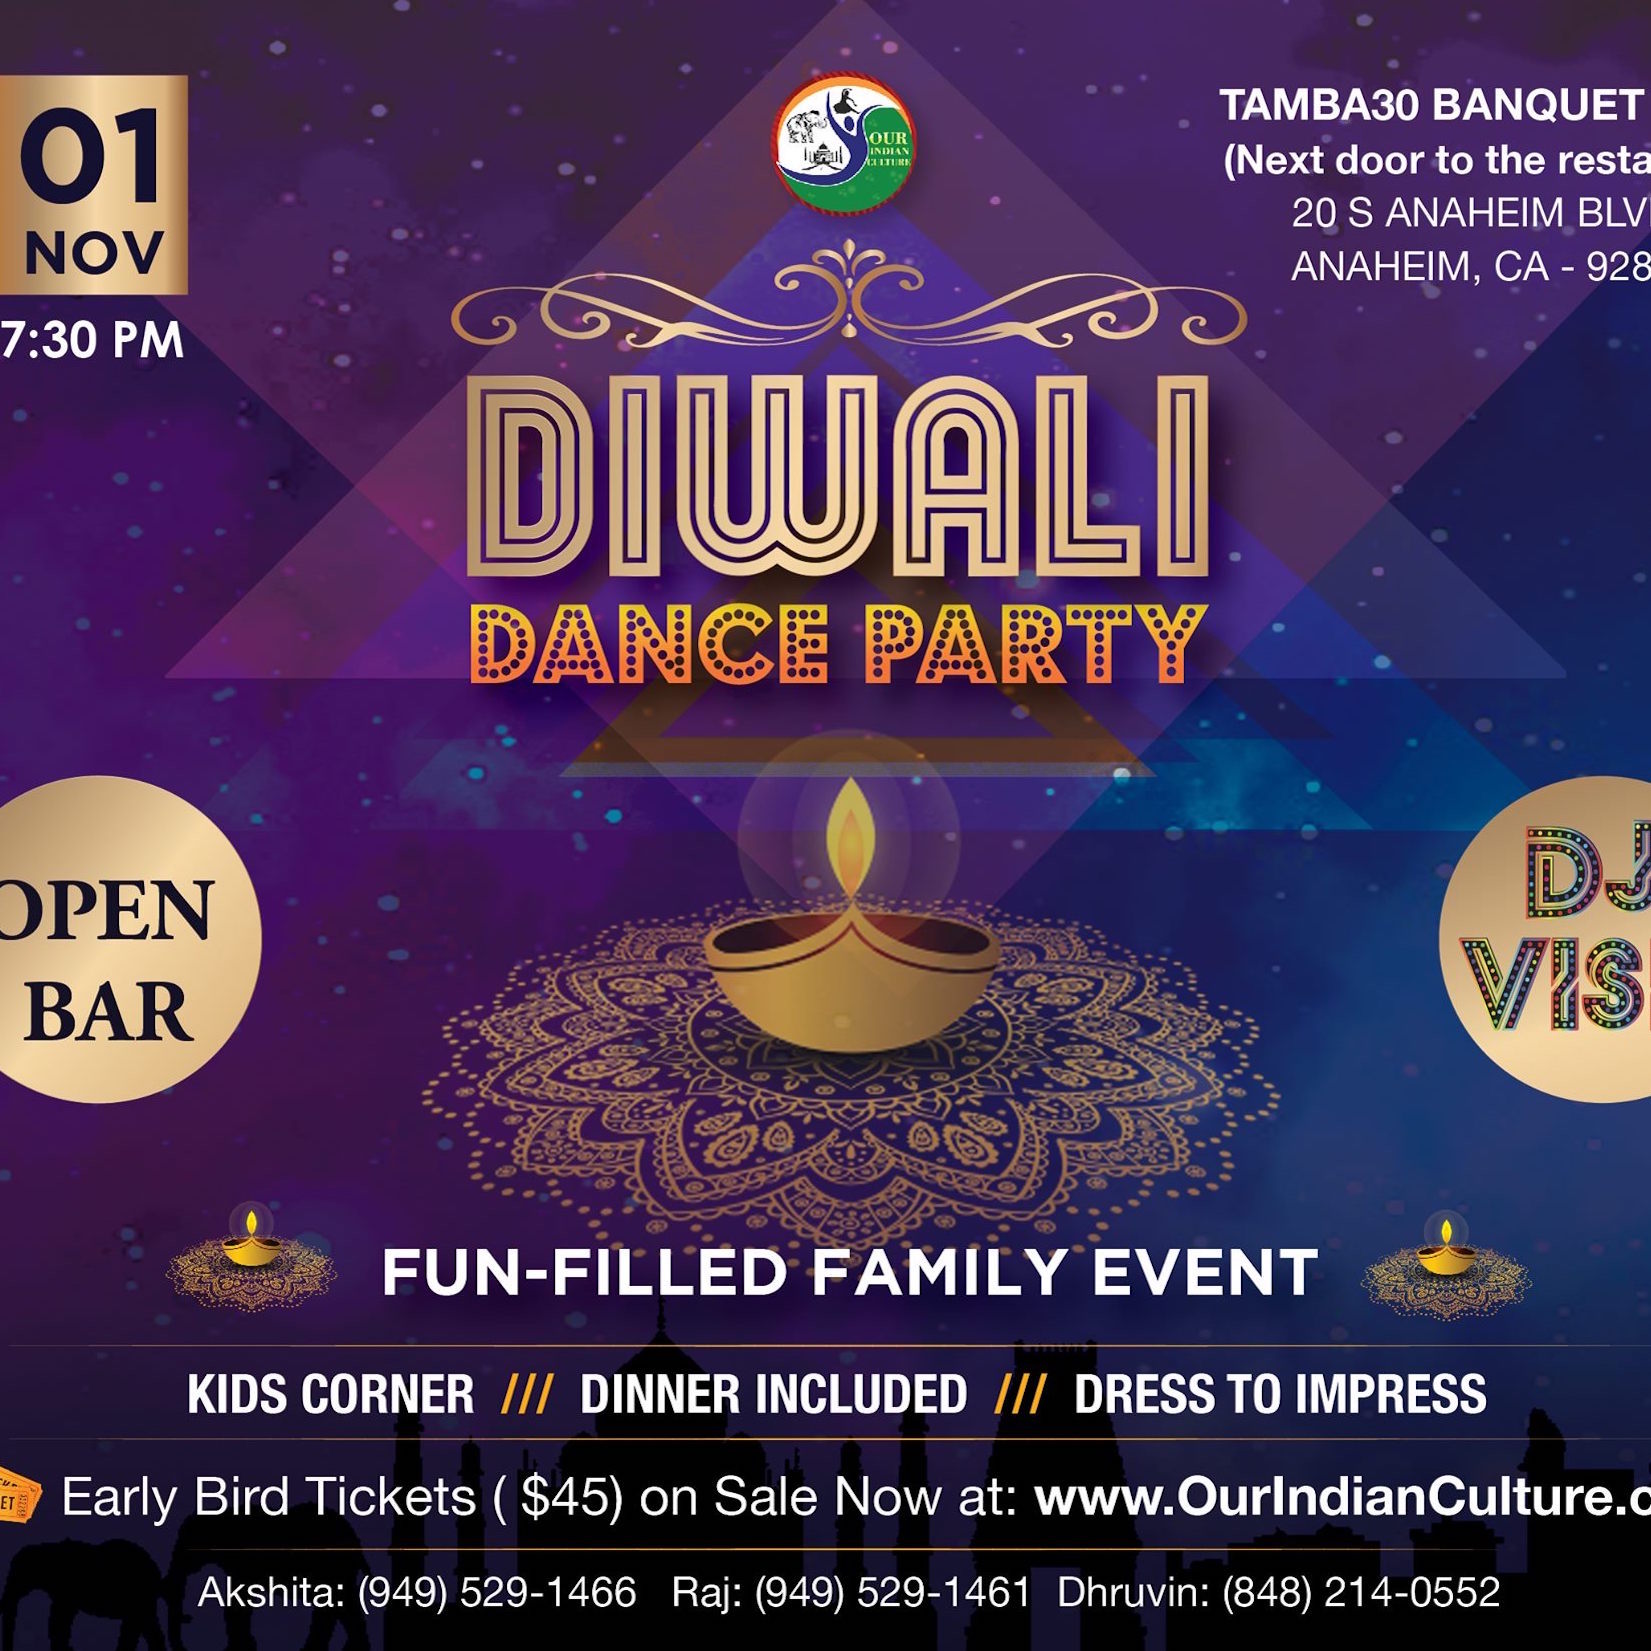 Diwali Dance Party Anaheim